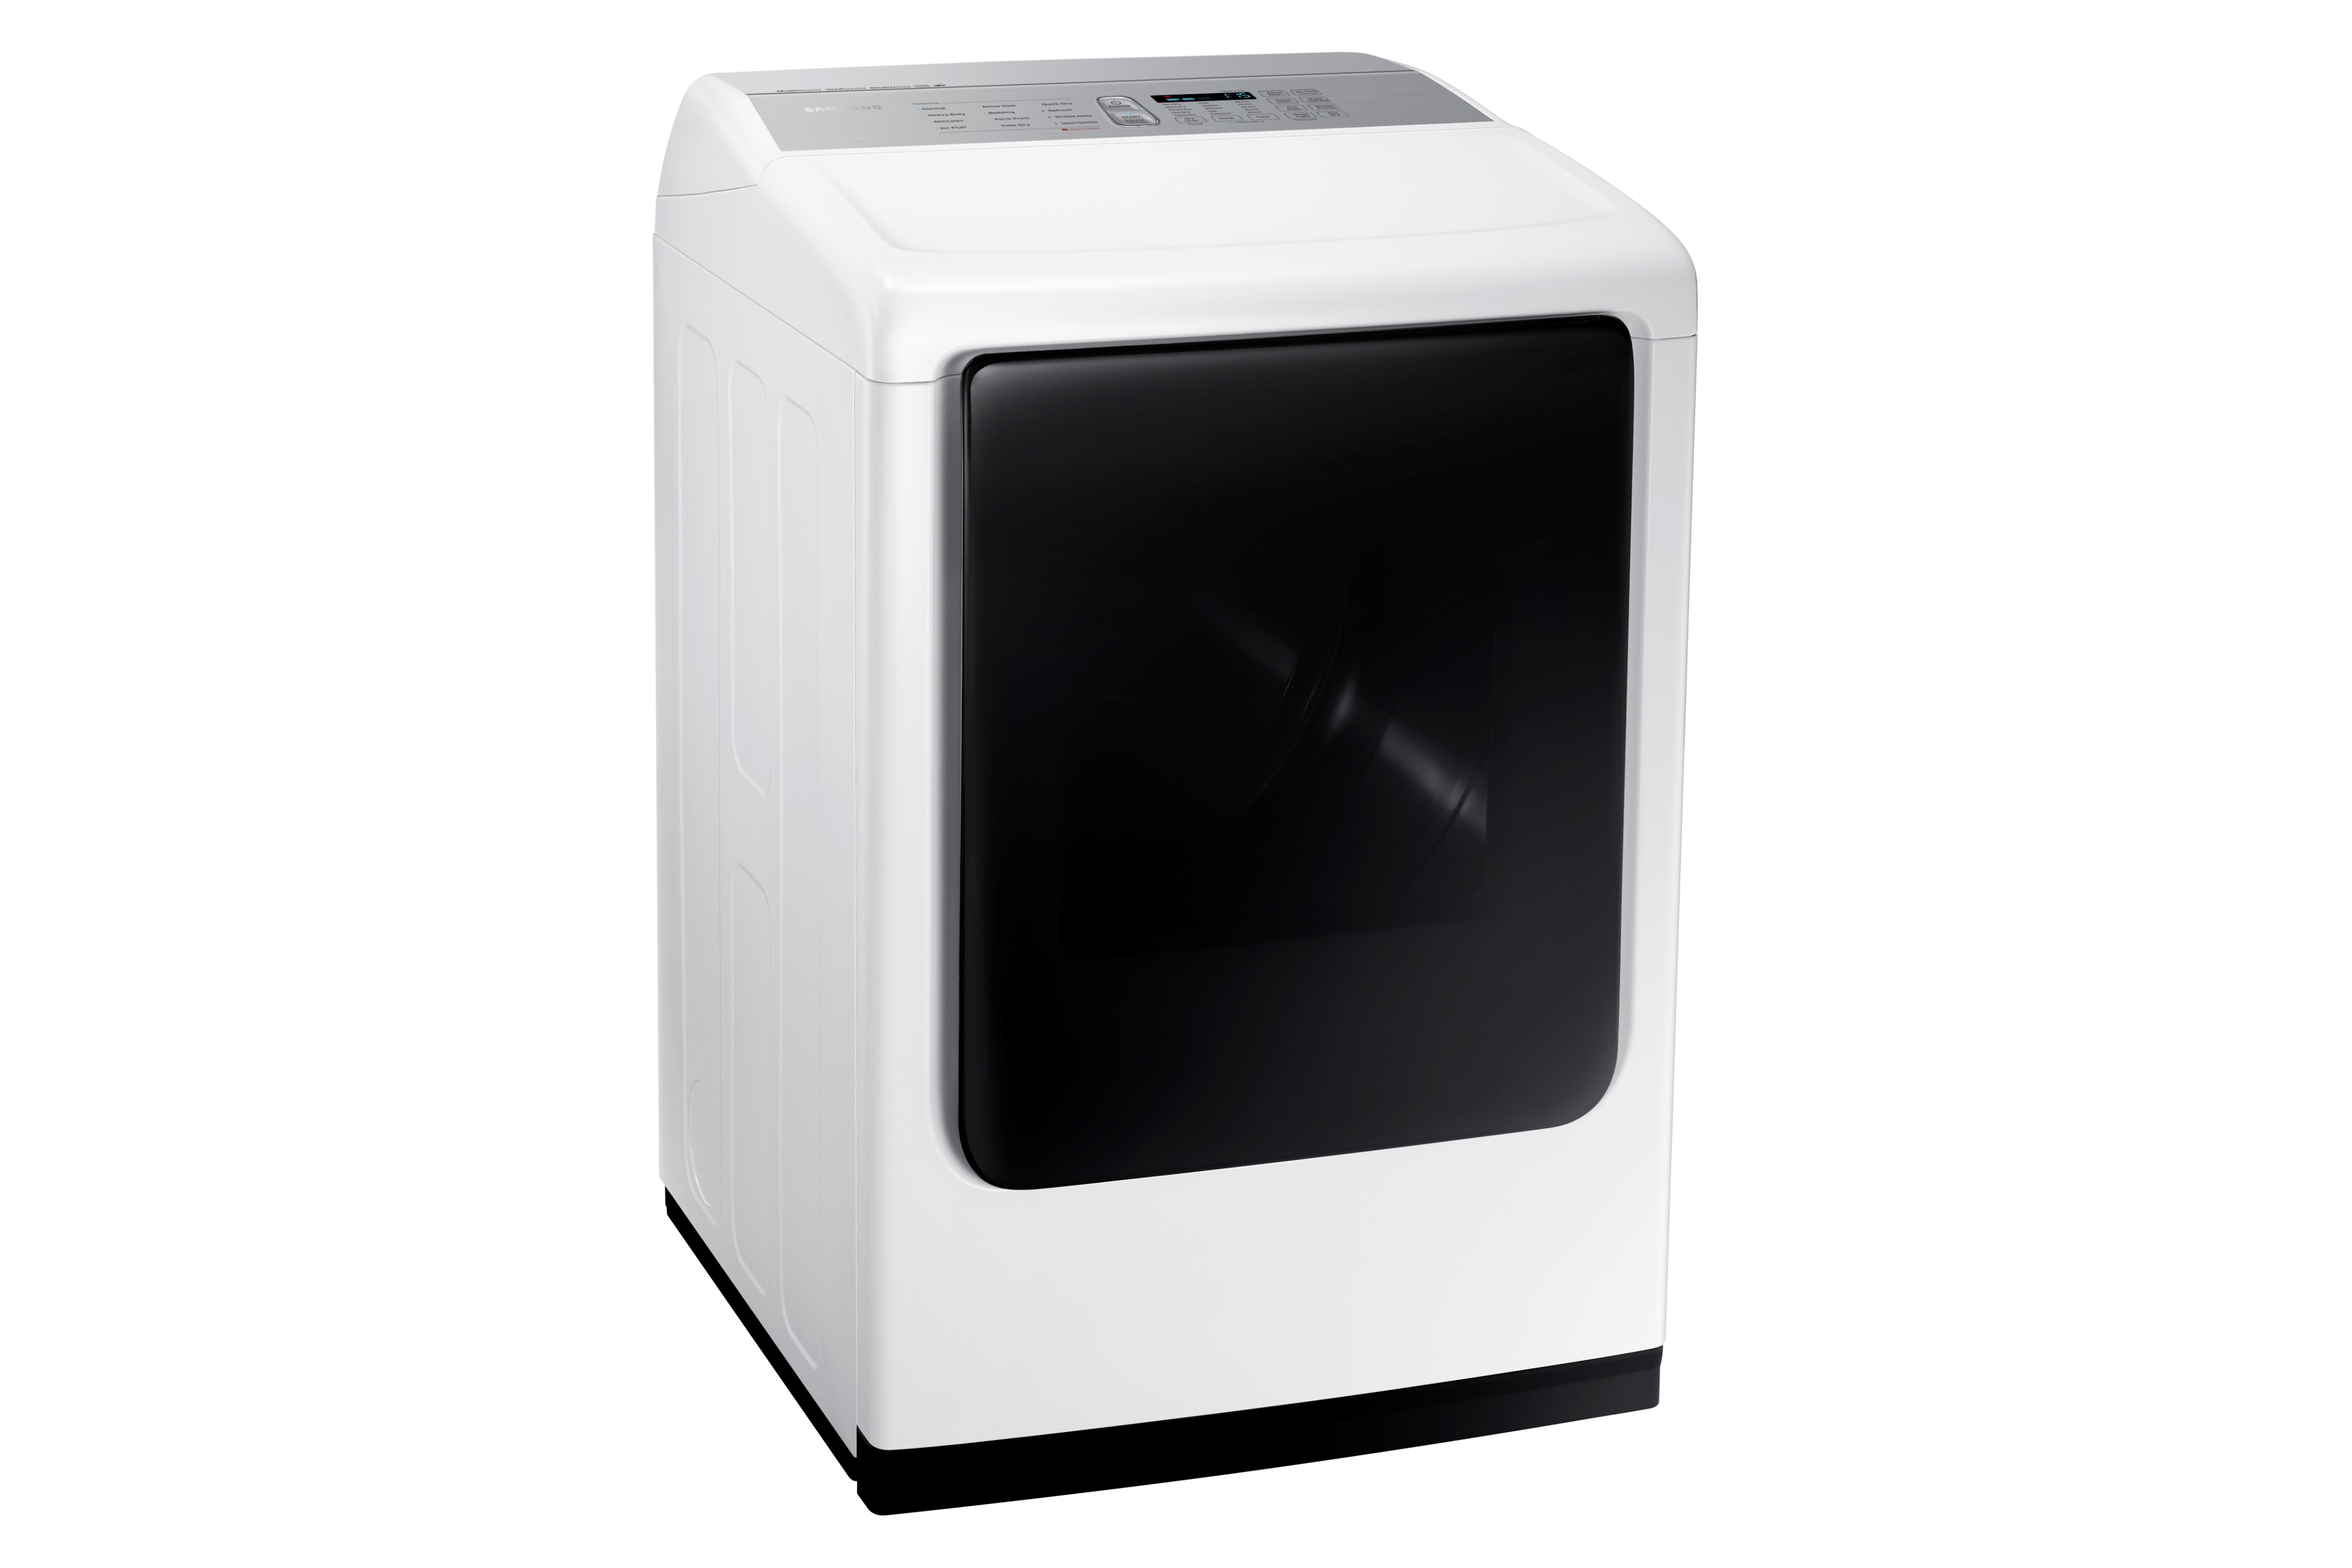 Samsung DV50K8600GW 7.4 cu. ft. Large Capacity Gas Front Load Dryer White